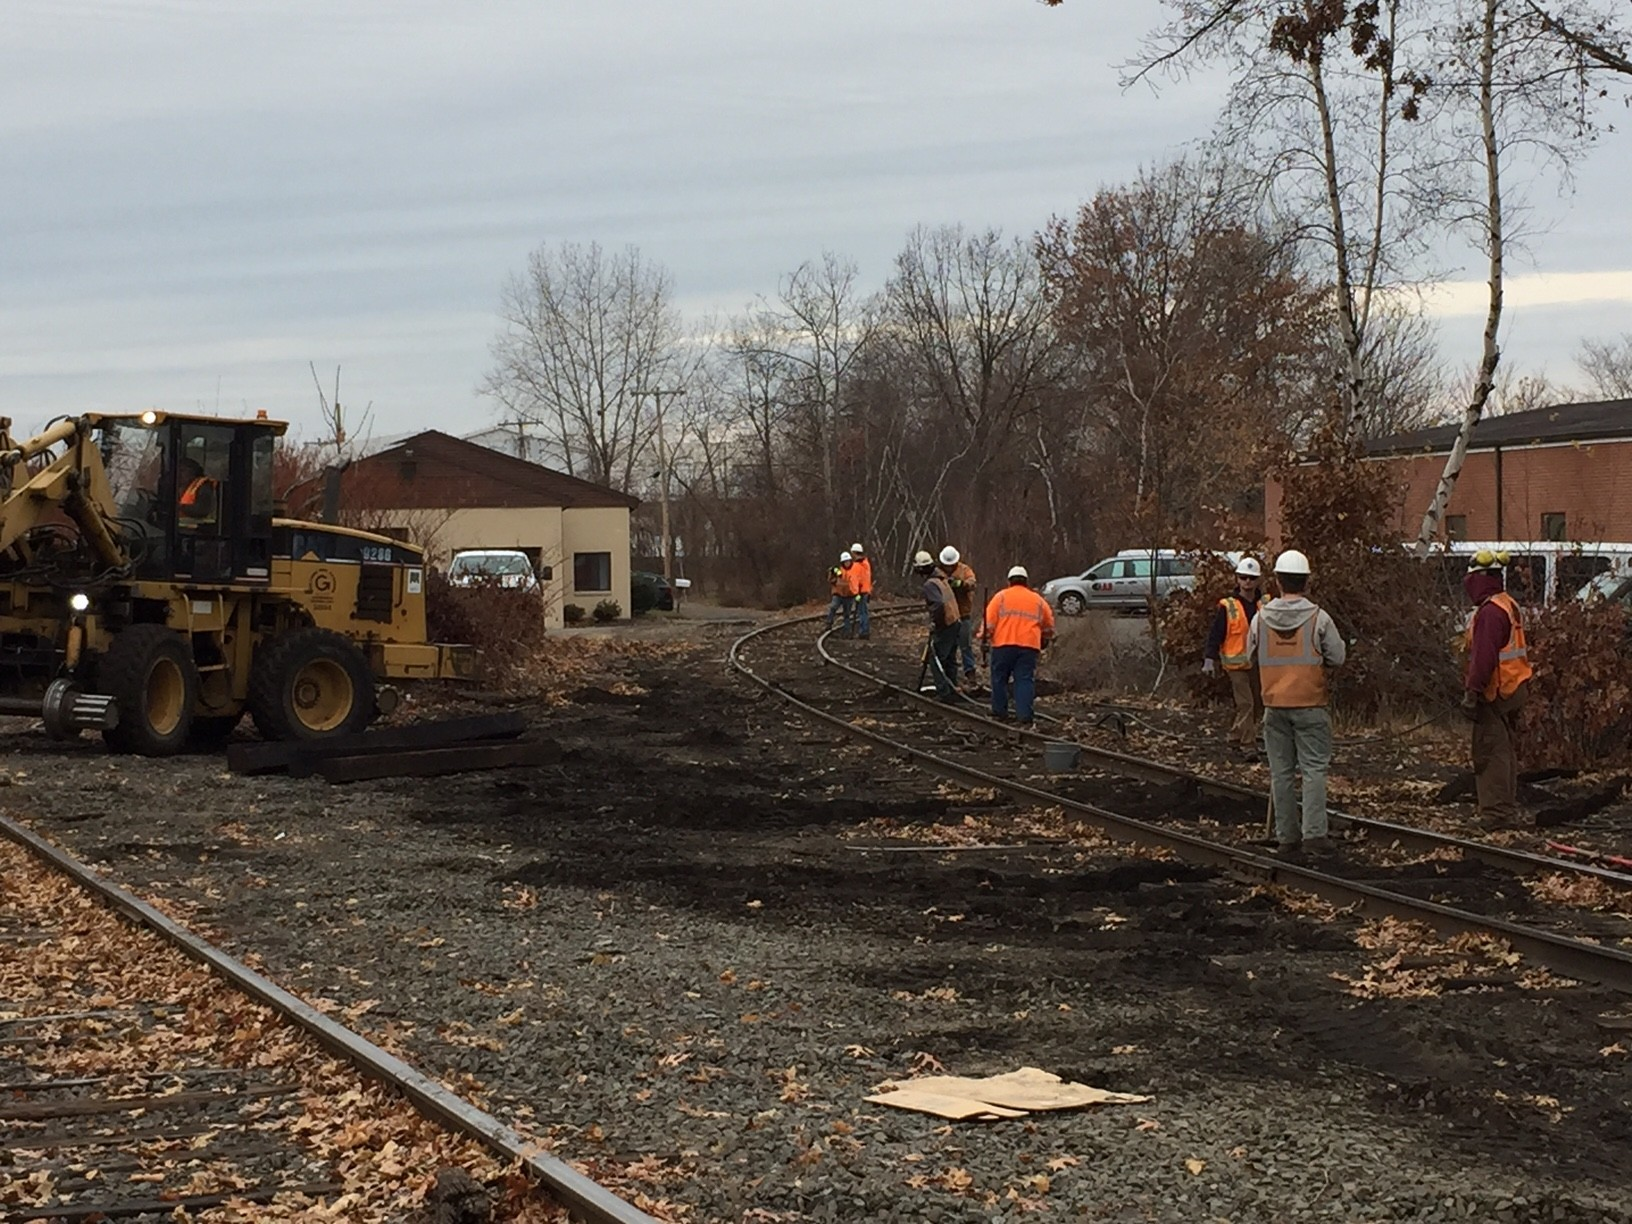 Train Derailment In Plainville Cleared - Hartford Courant